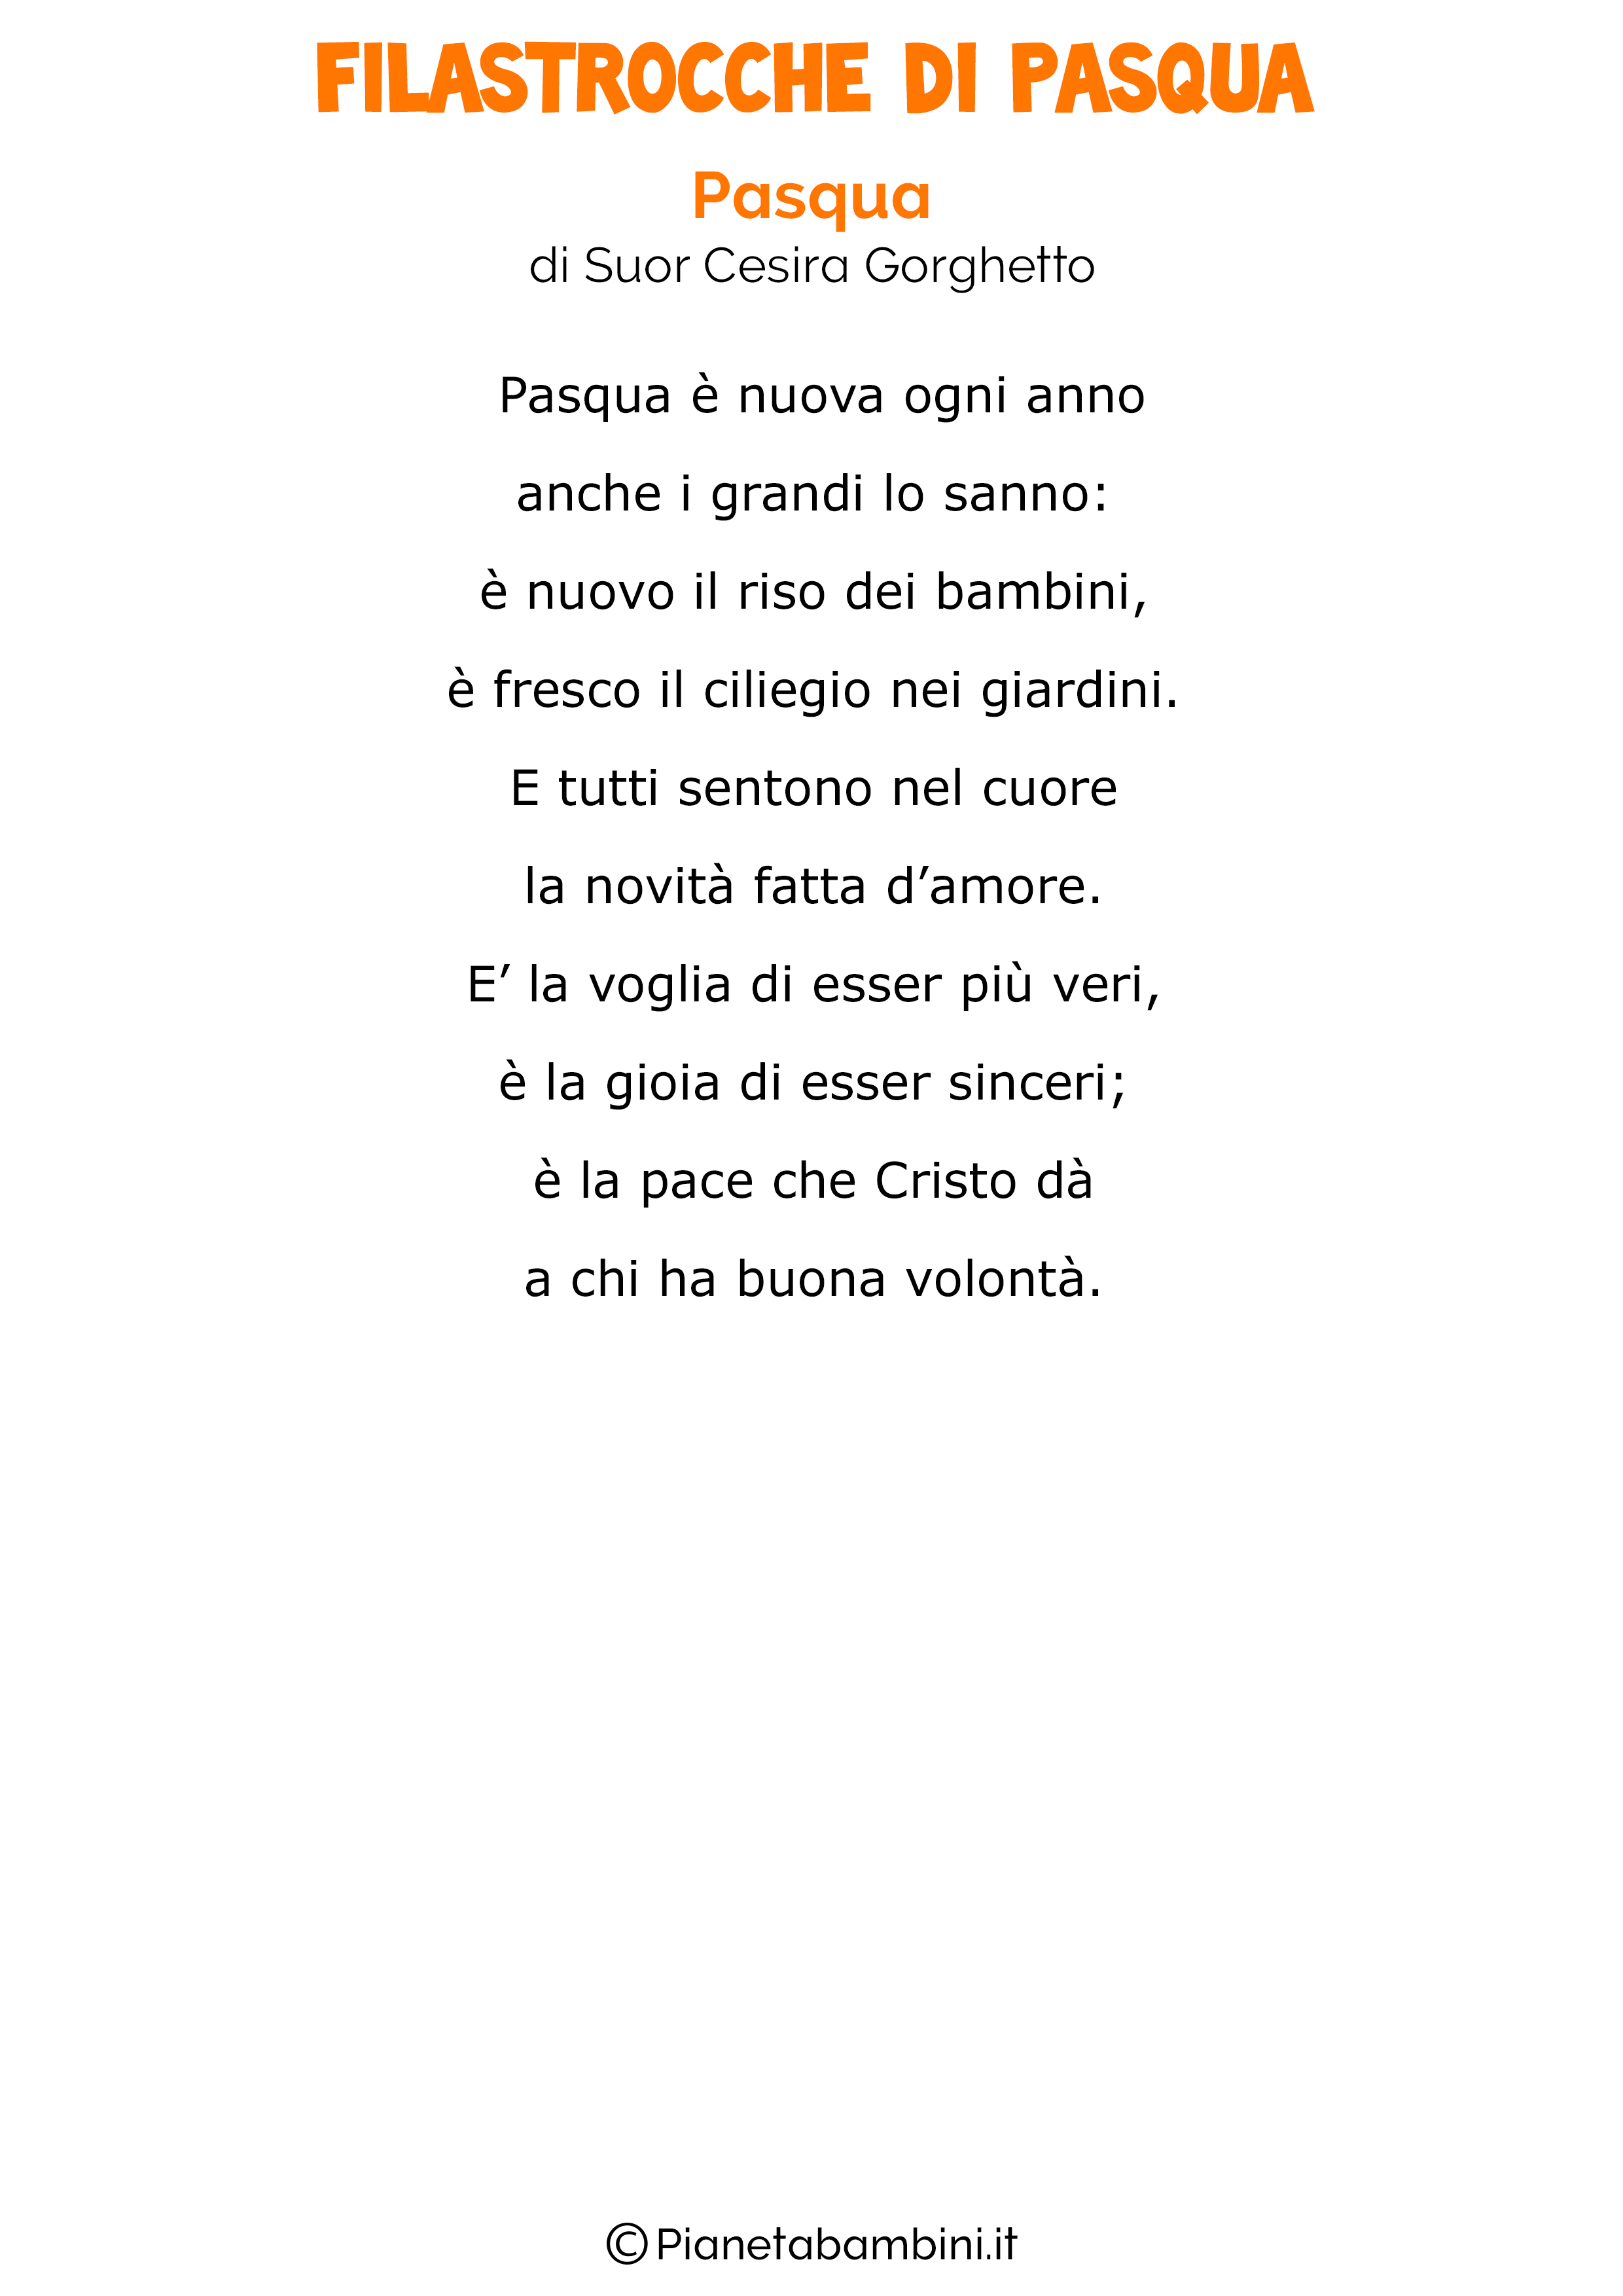 Pasqua-Suor-Cesira-Gorghetto